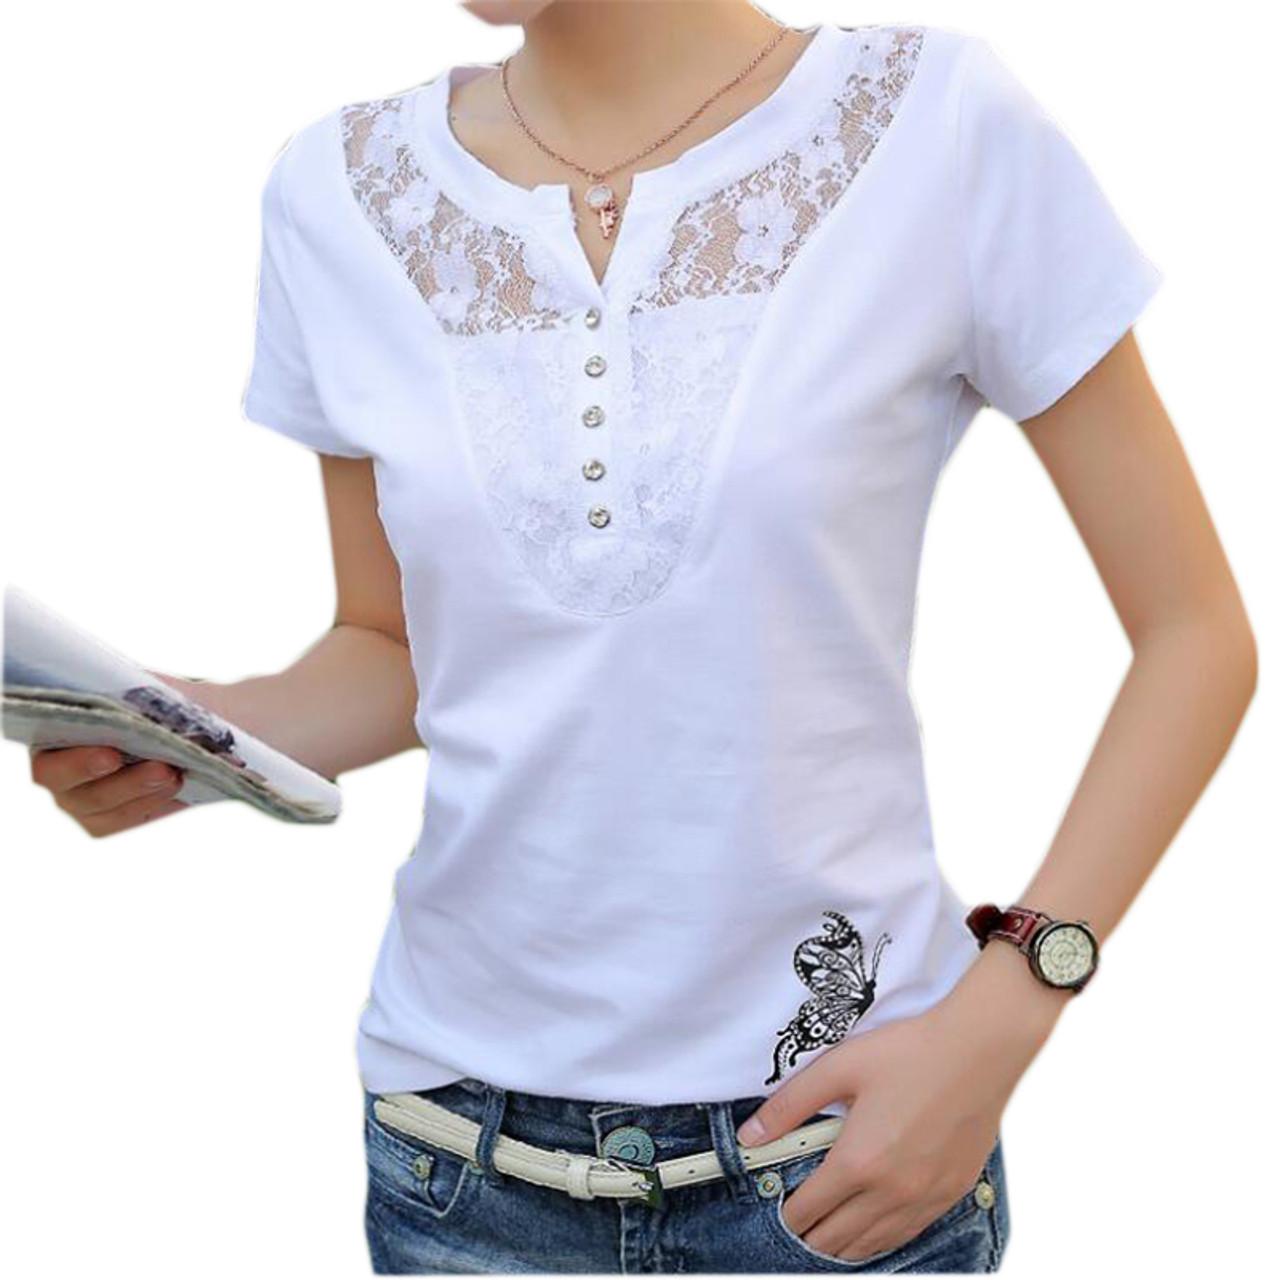 17934c58 Summer T-shirt Women Casual Lady Top Tees Cotton White Tshirt Female Brand Clothing  T ...